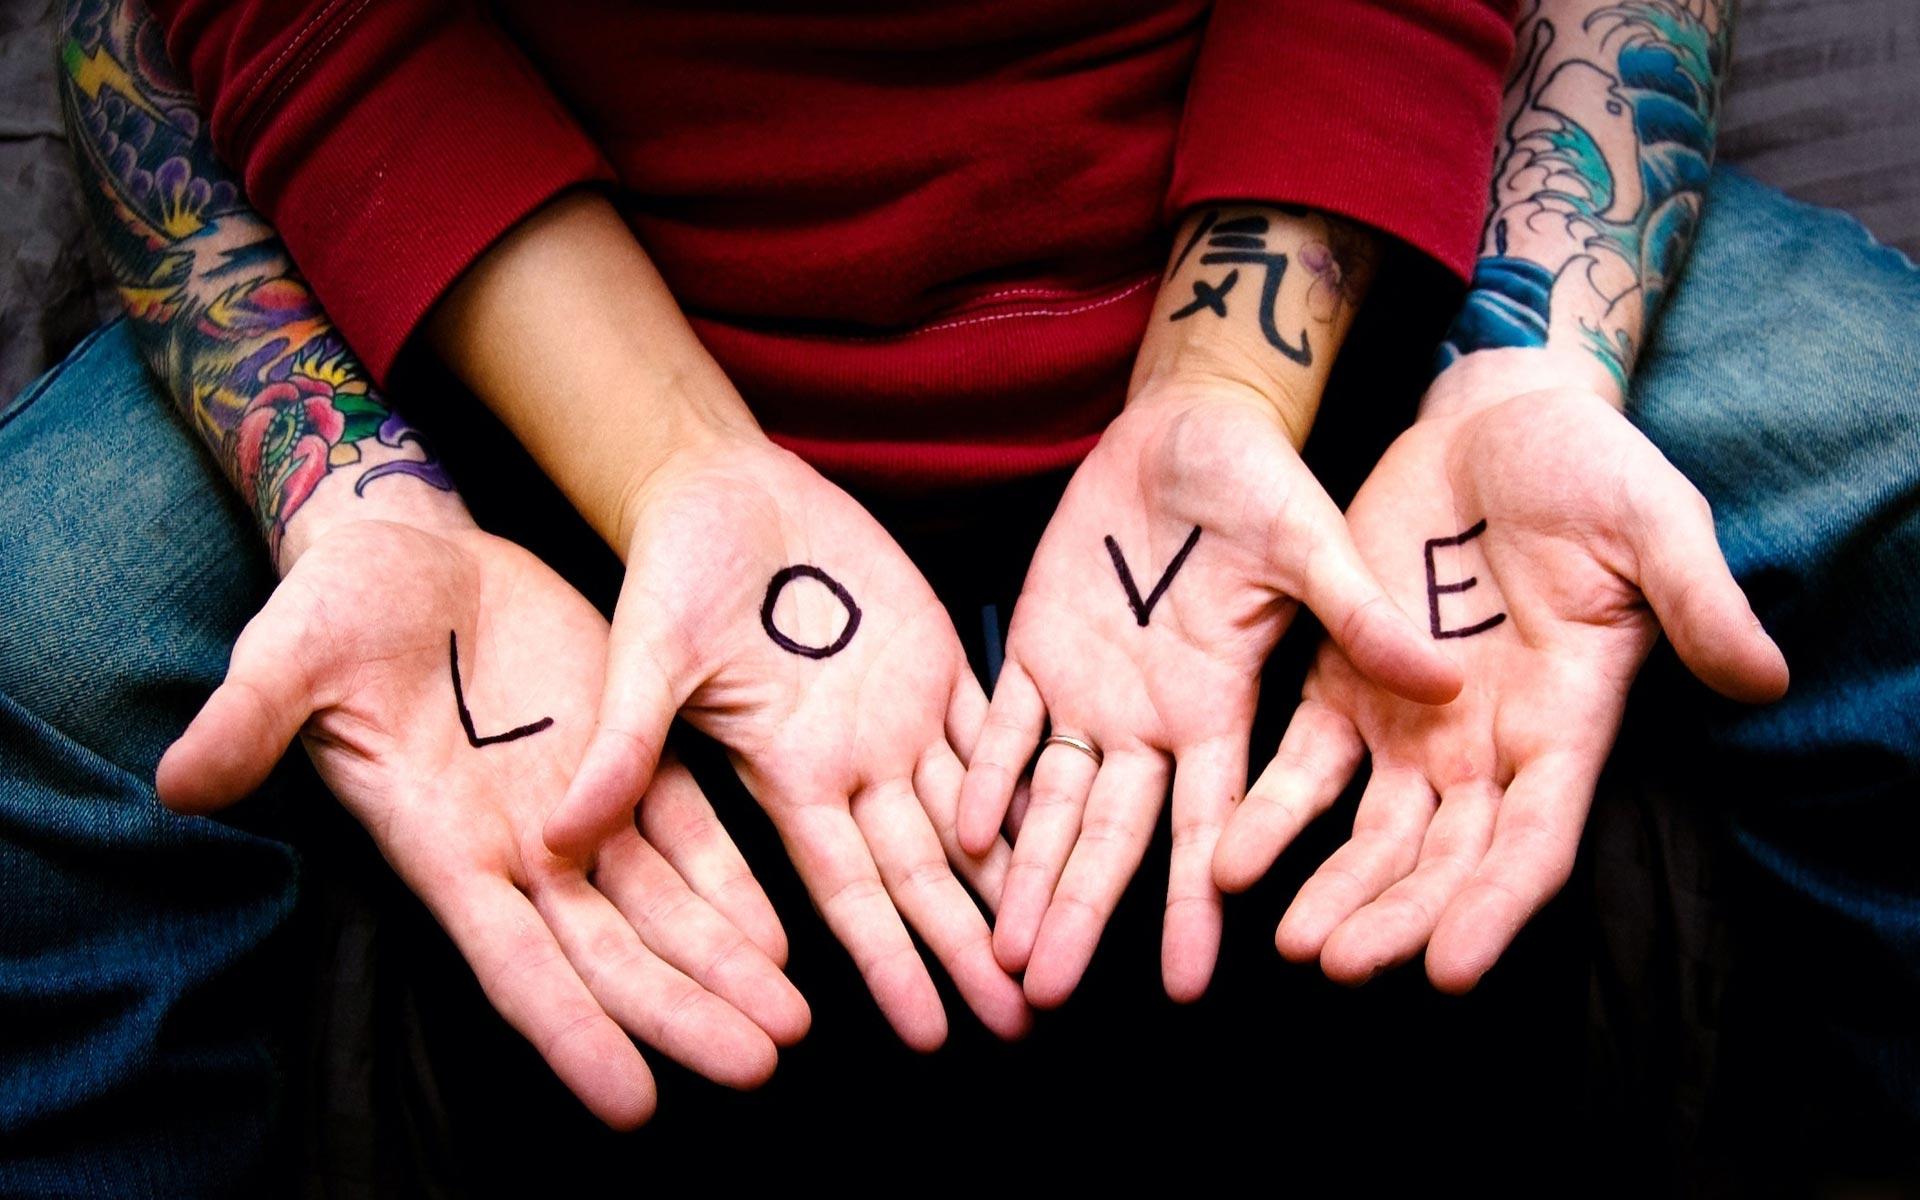 بالصور اروع صور الحب , احل و اروع صور في الحب و الغرام 3308 9